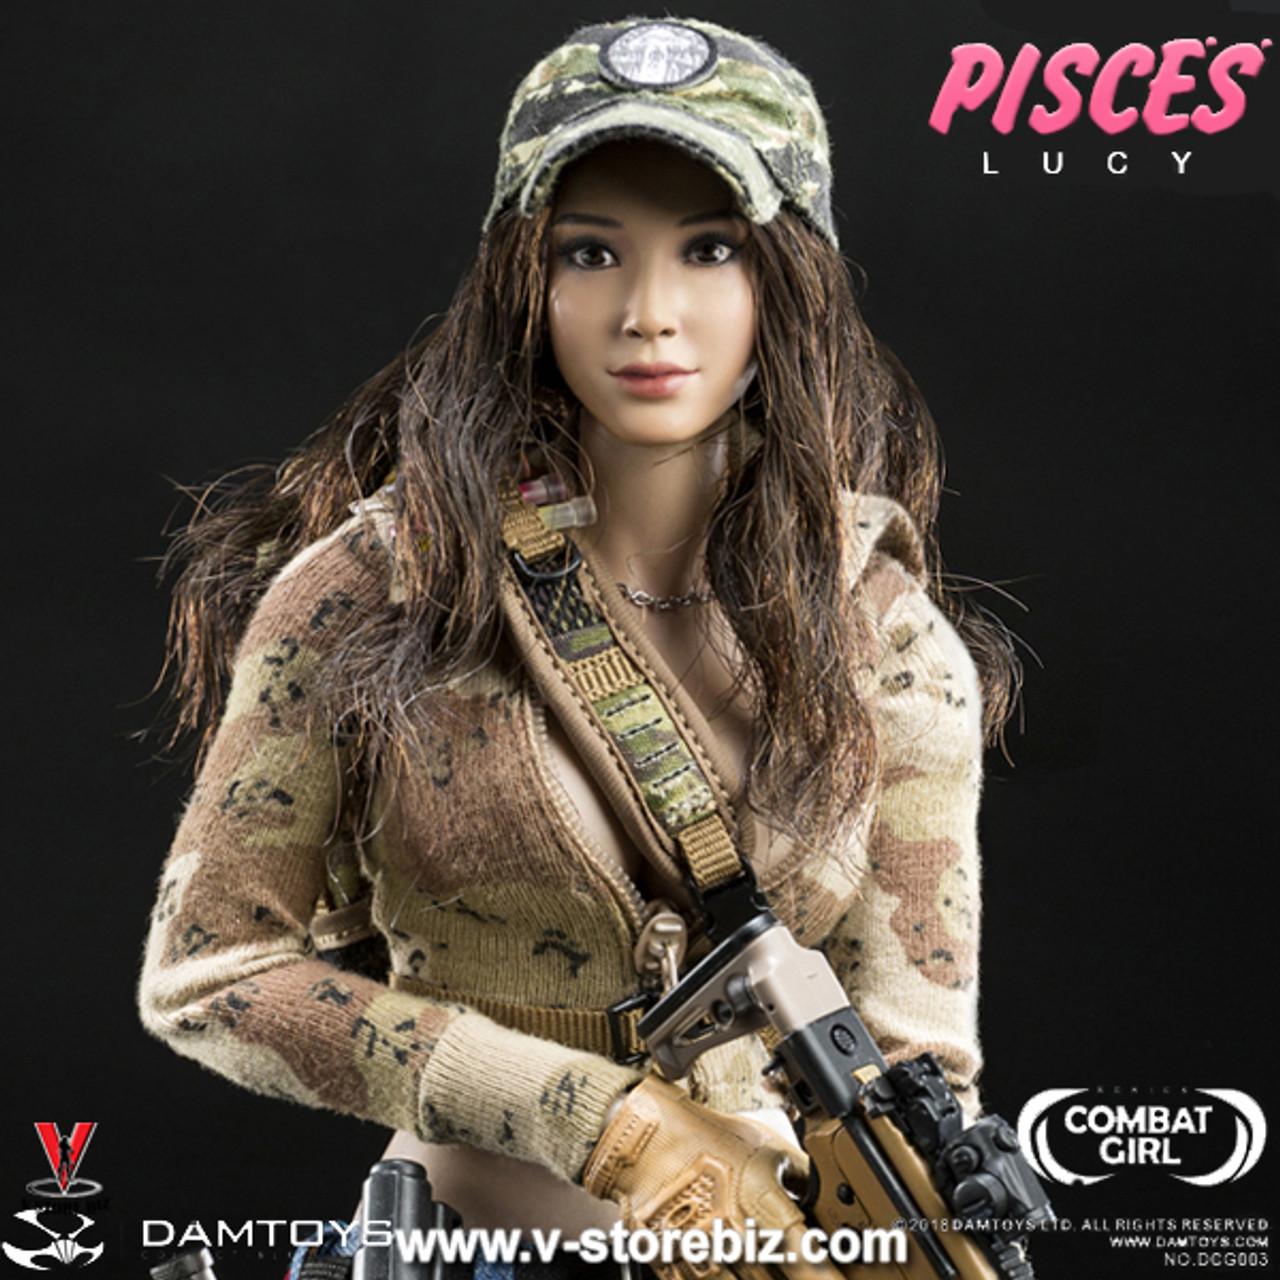 Head Sculpt for DAMTOYS DAM DCG004 Combat Girl Series PISCES Lucy 1//6 Scale 12/'/'